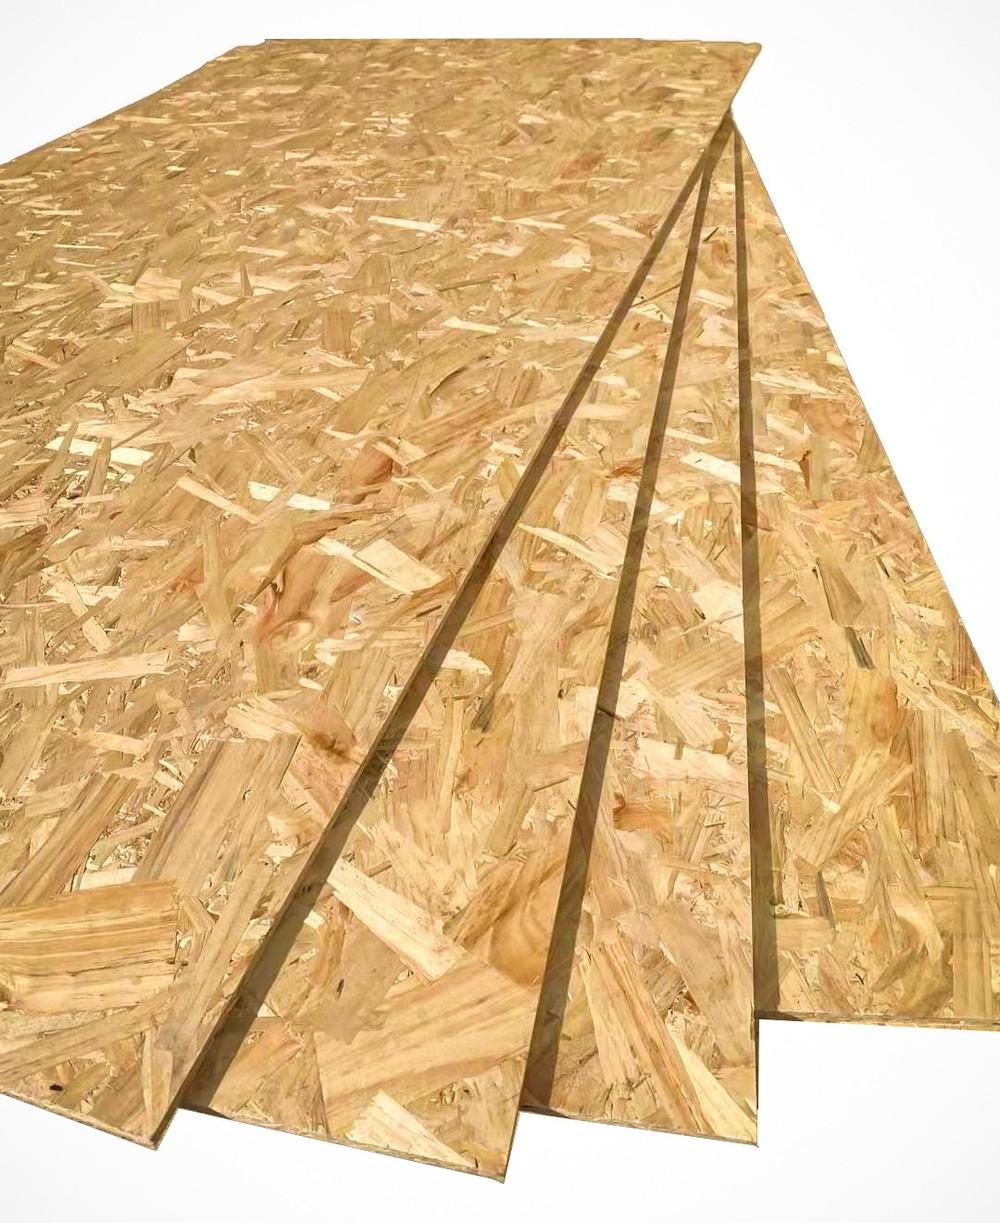 11 osb plates for sheeting / osb/4